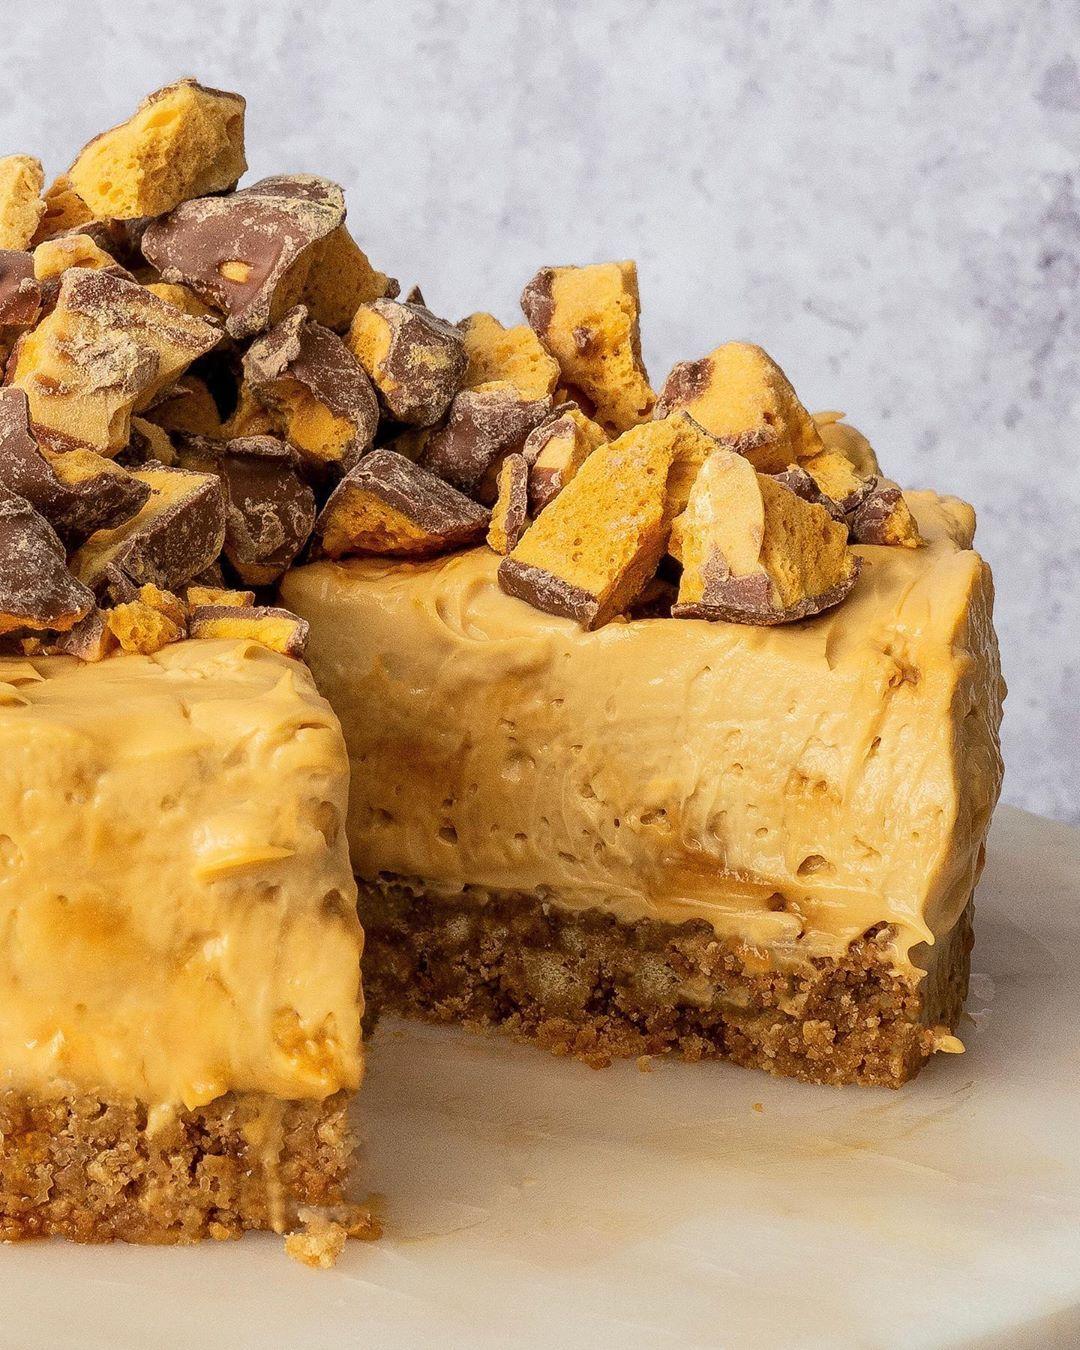 Gluten free cheesecake anyone want the recipe